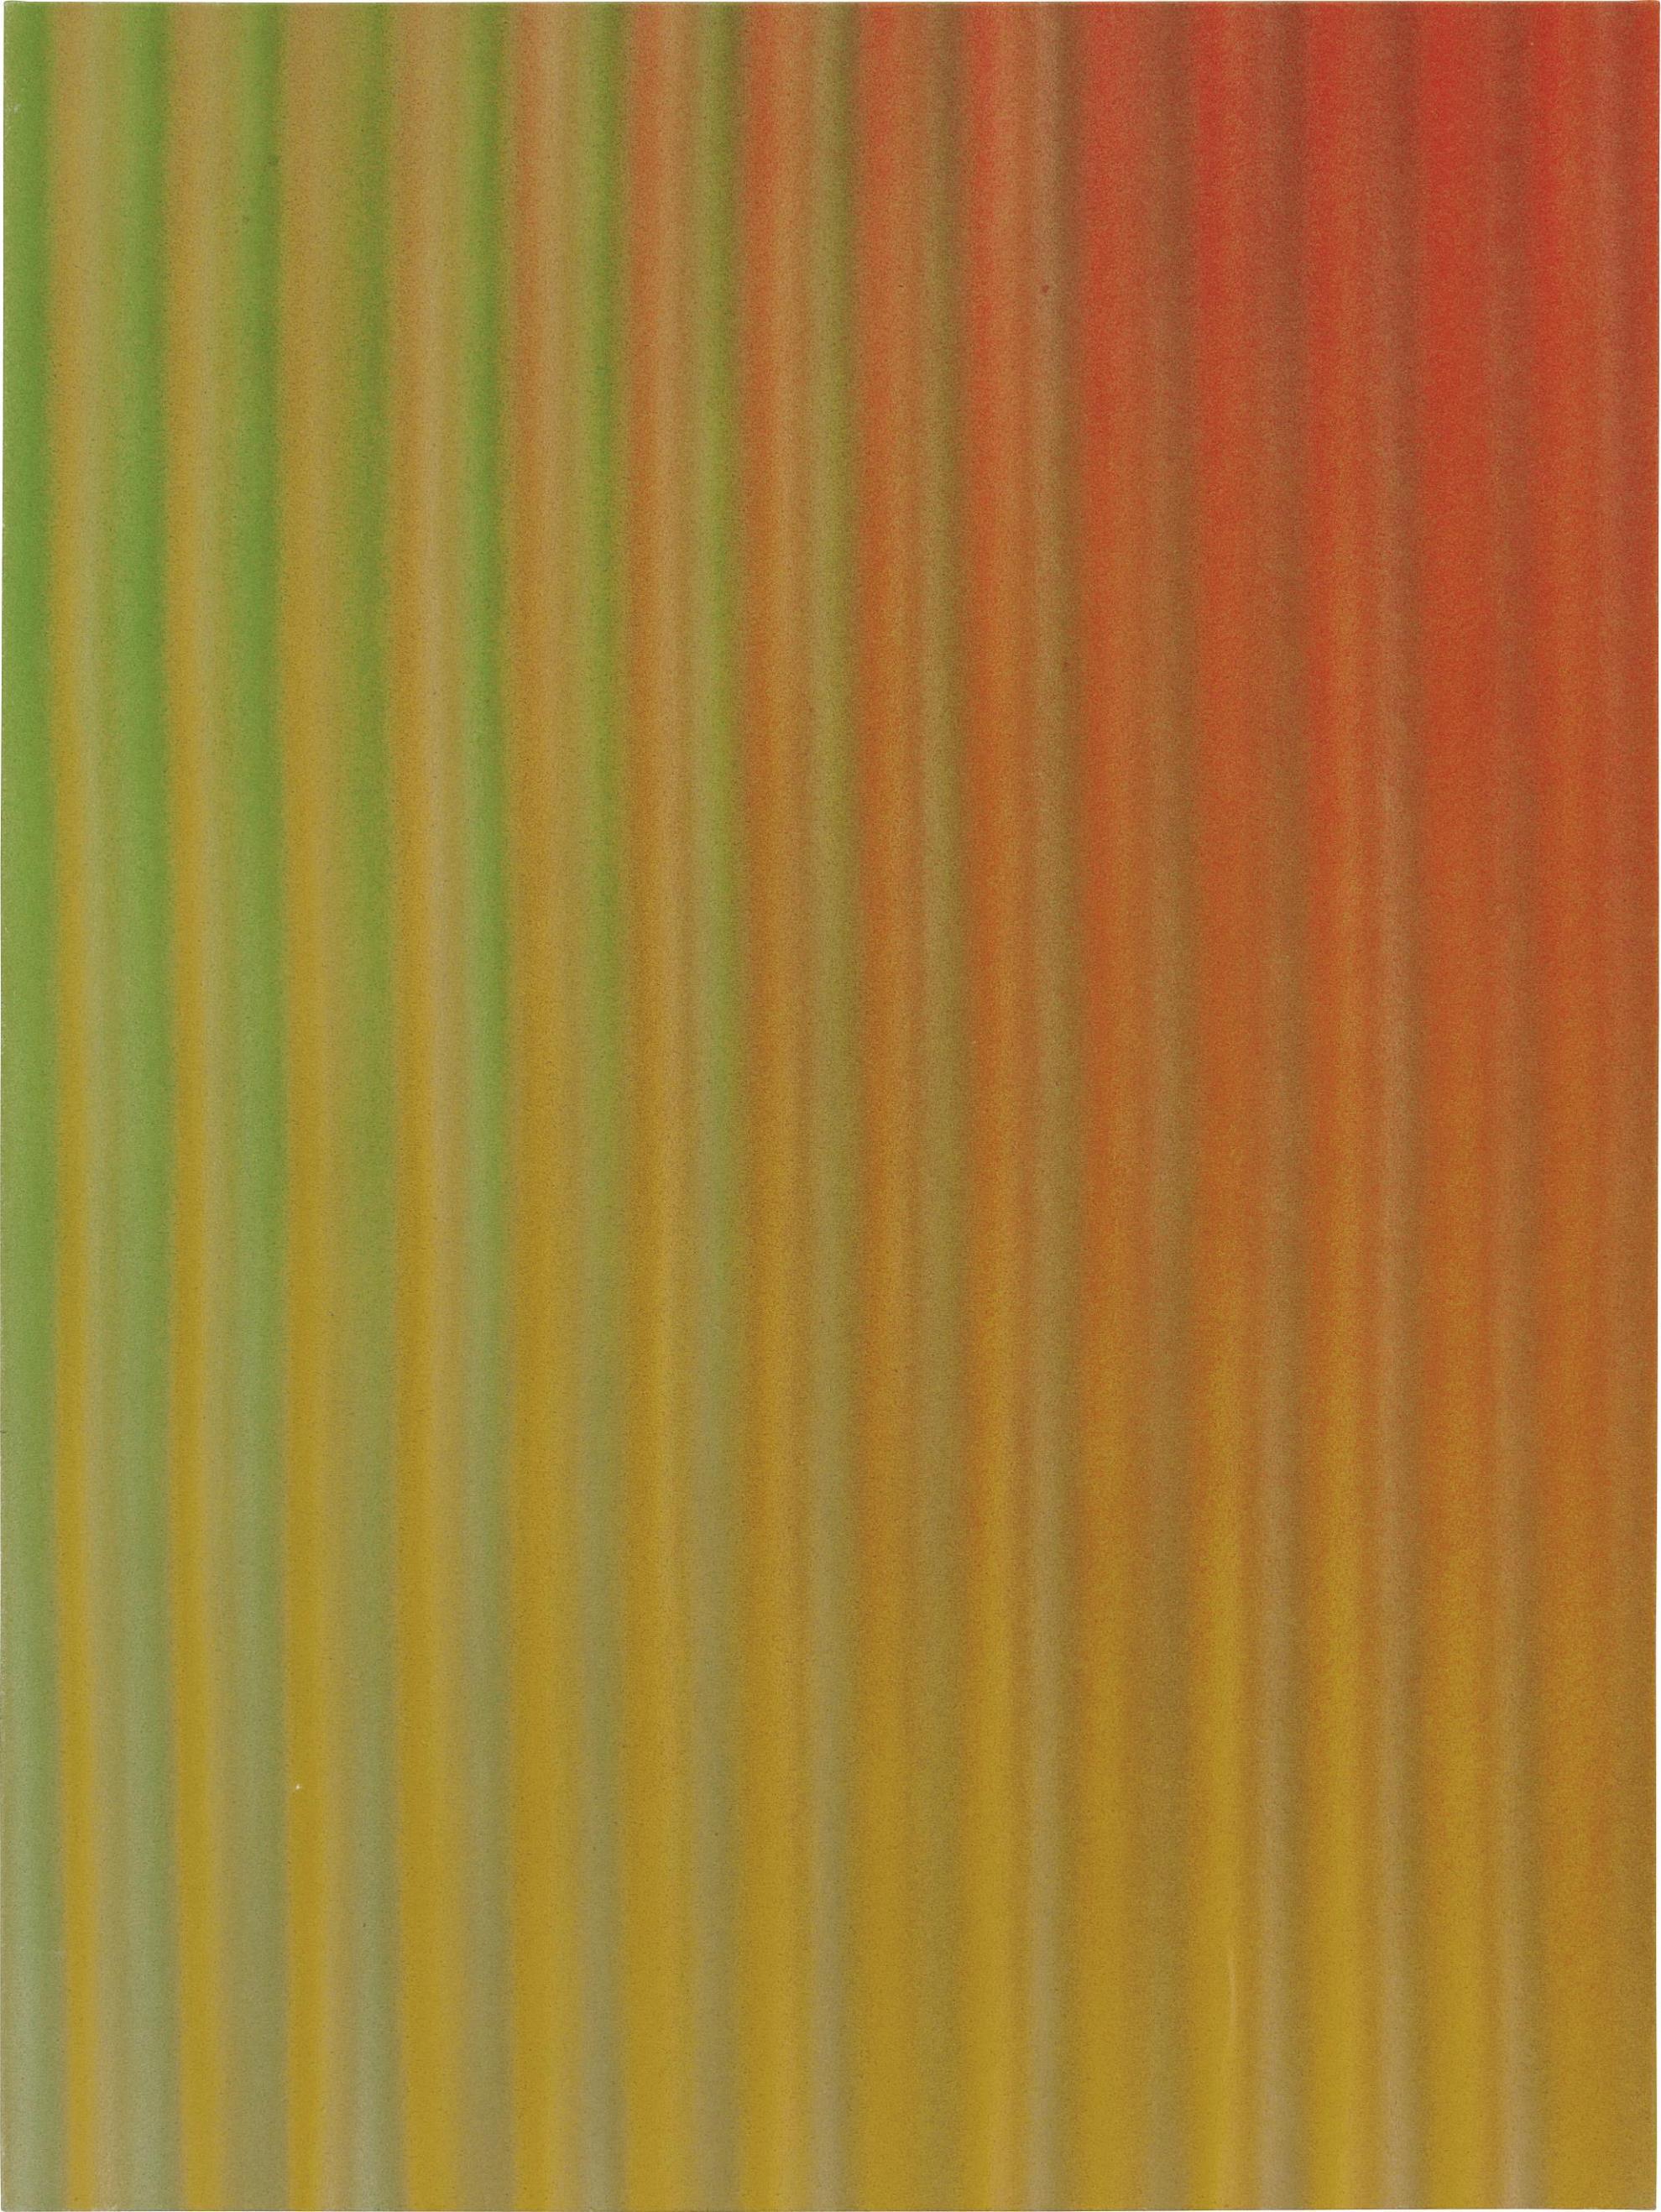 Tauba Auerbach-Corrugation III-2011